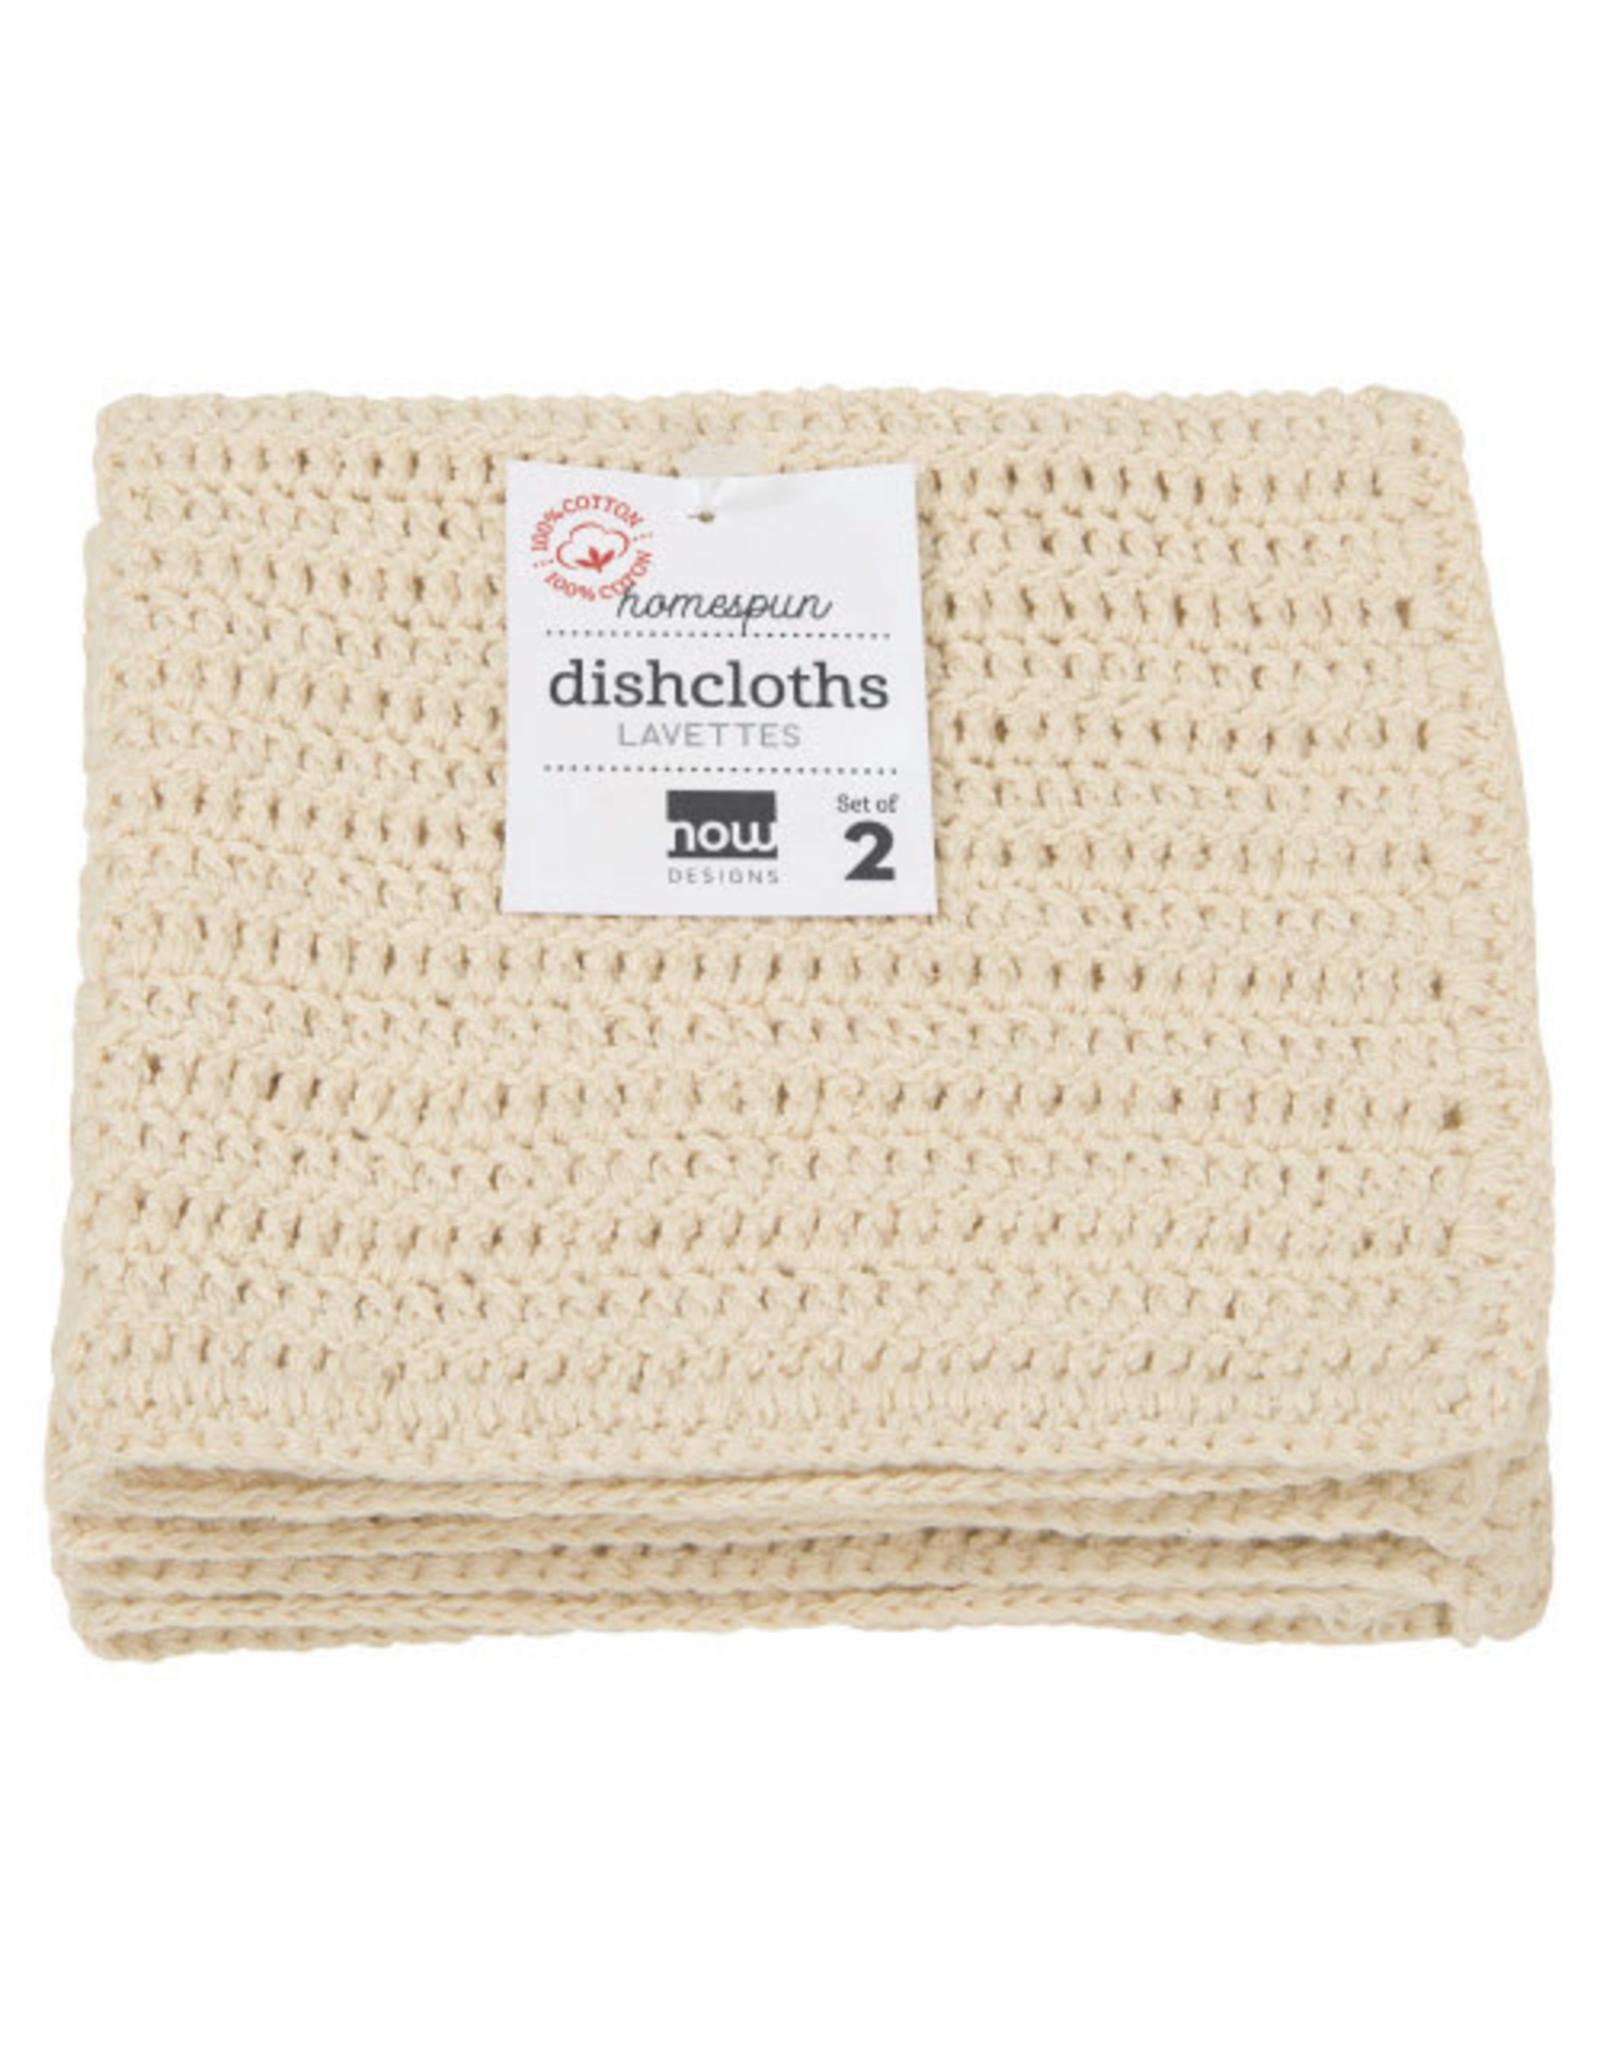 Homespun  Dishcloth  Set of 2  - Natural